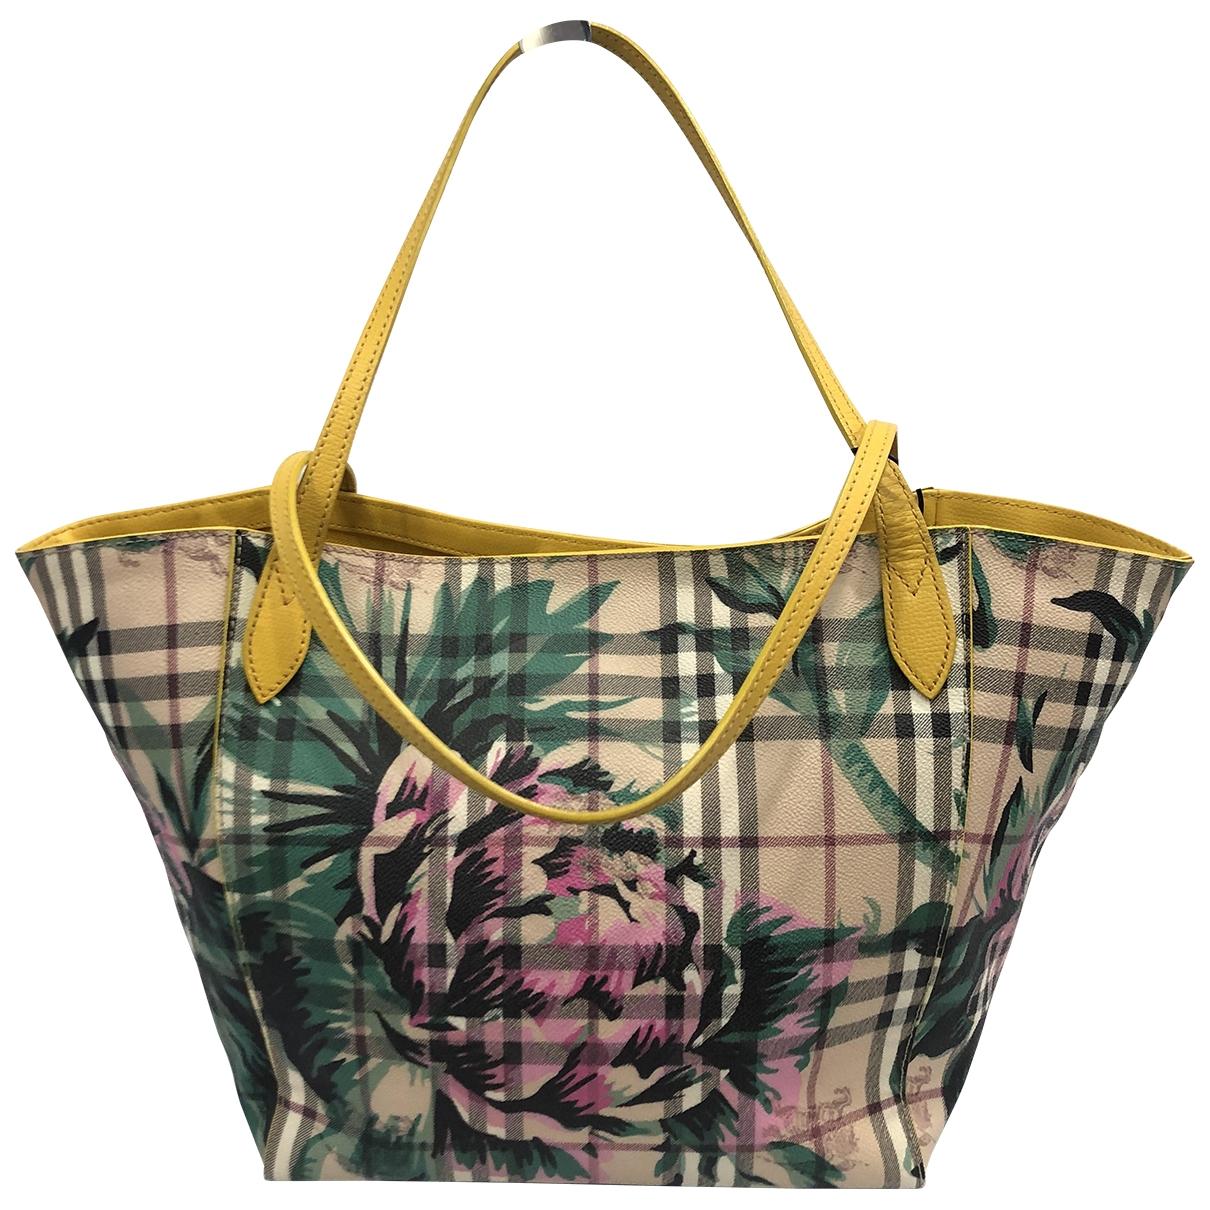 Burberry \N Multicolour Cloth handbag for Women \N